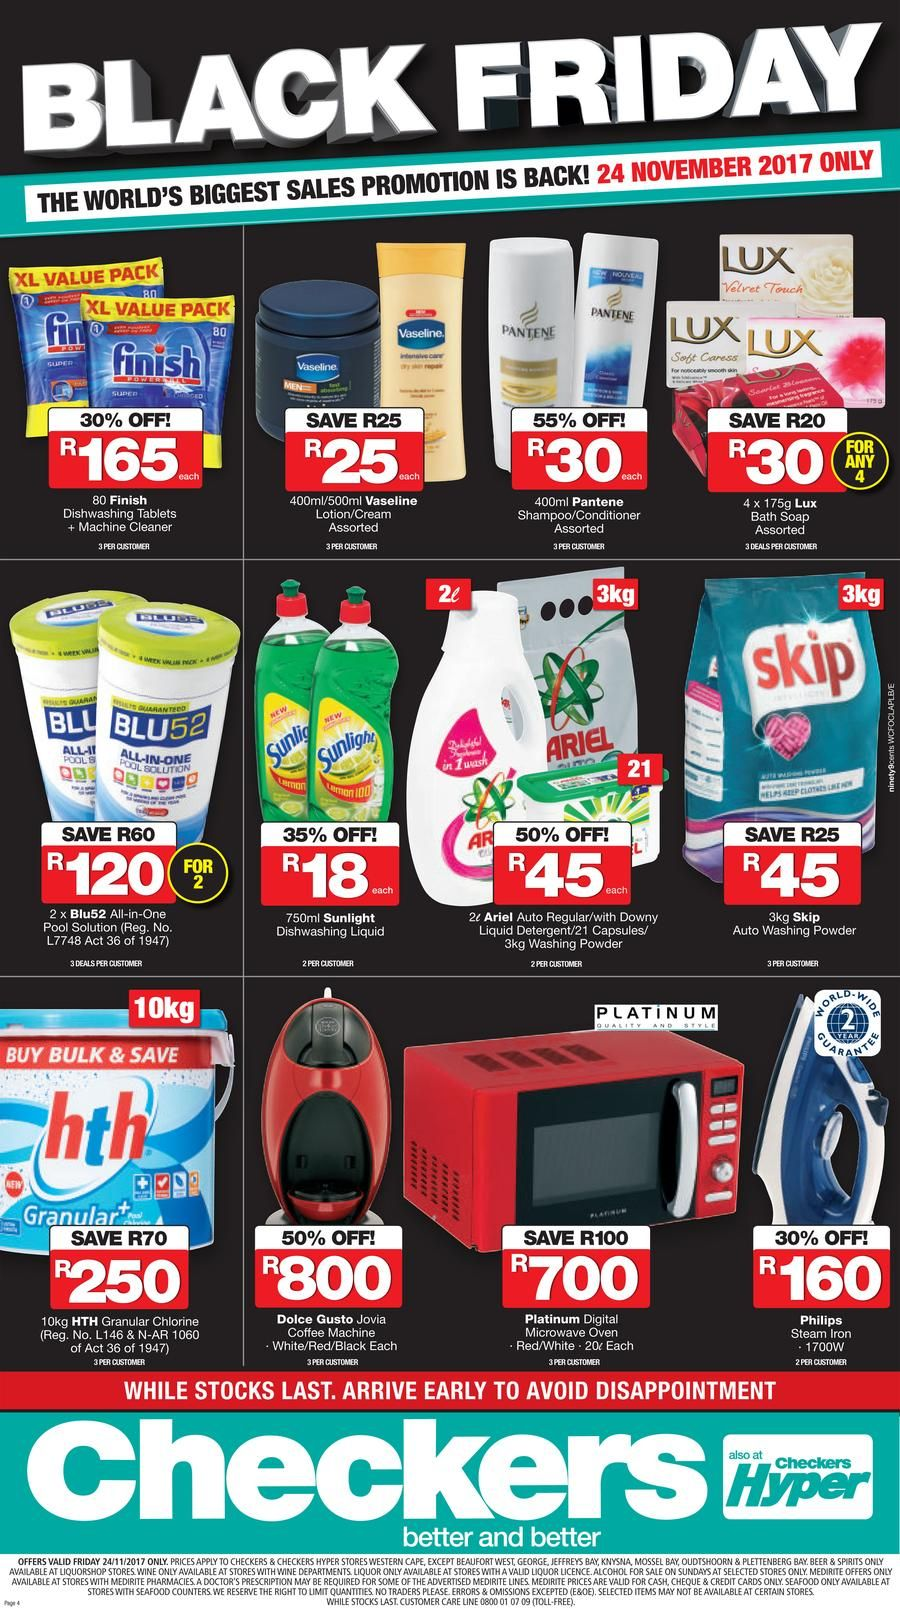 Black Friday South Africa Specials Black Friday Black Sale Promotion